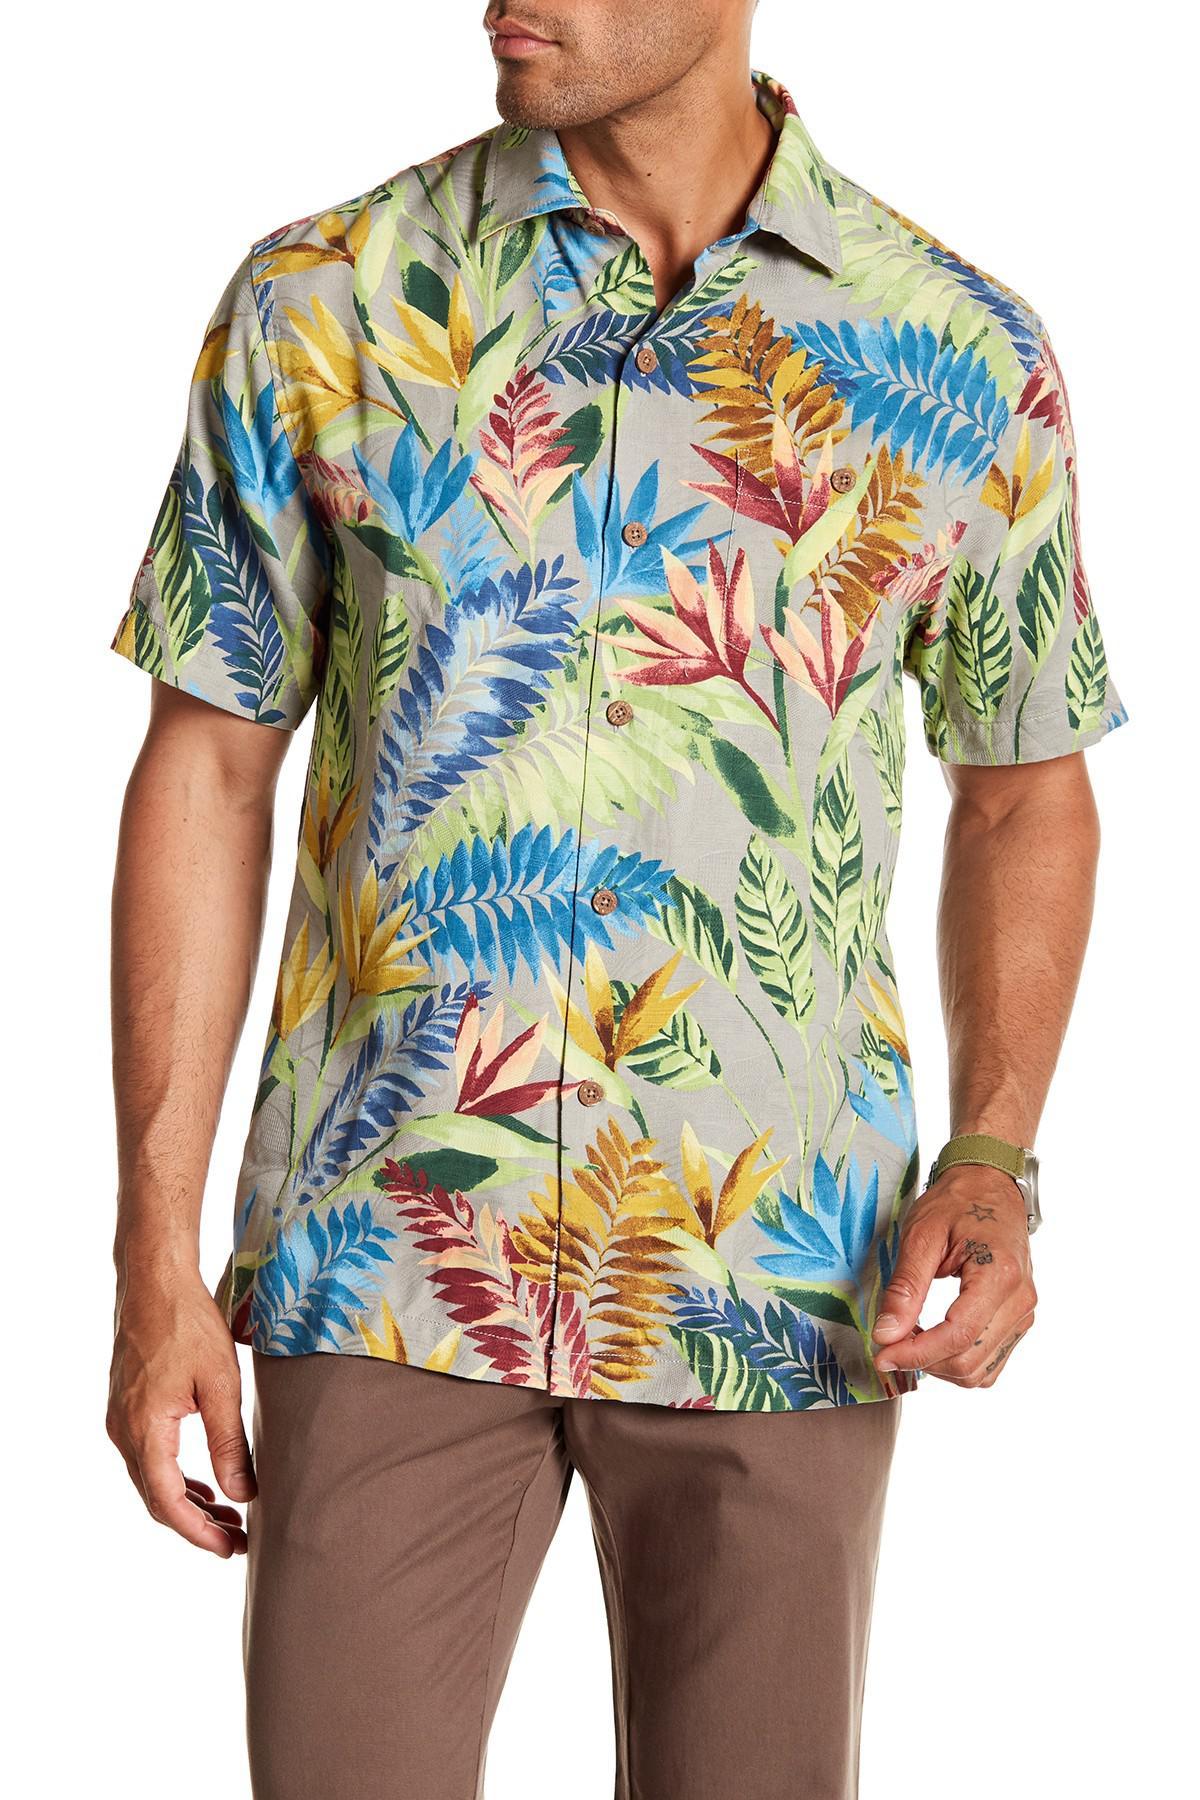 Tommy Bahama Taza Fronds-Pebble Grey Island Zone Silk Blend Camp Shirt $135